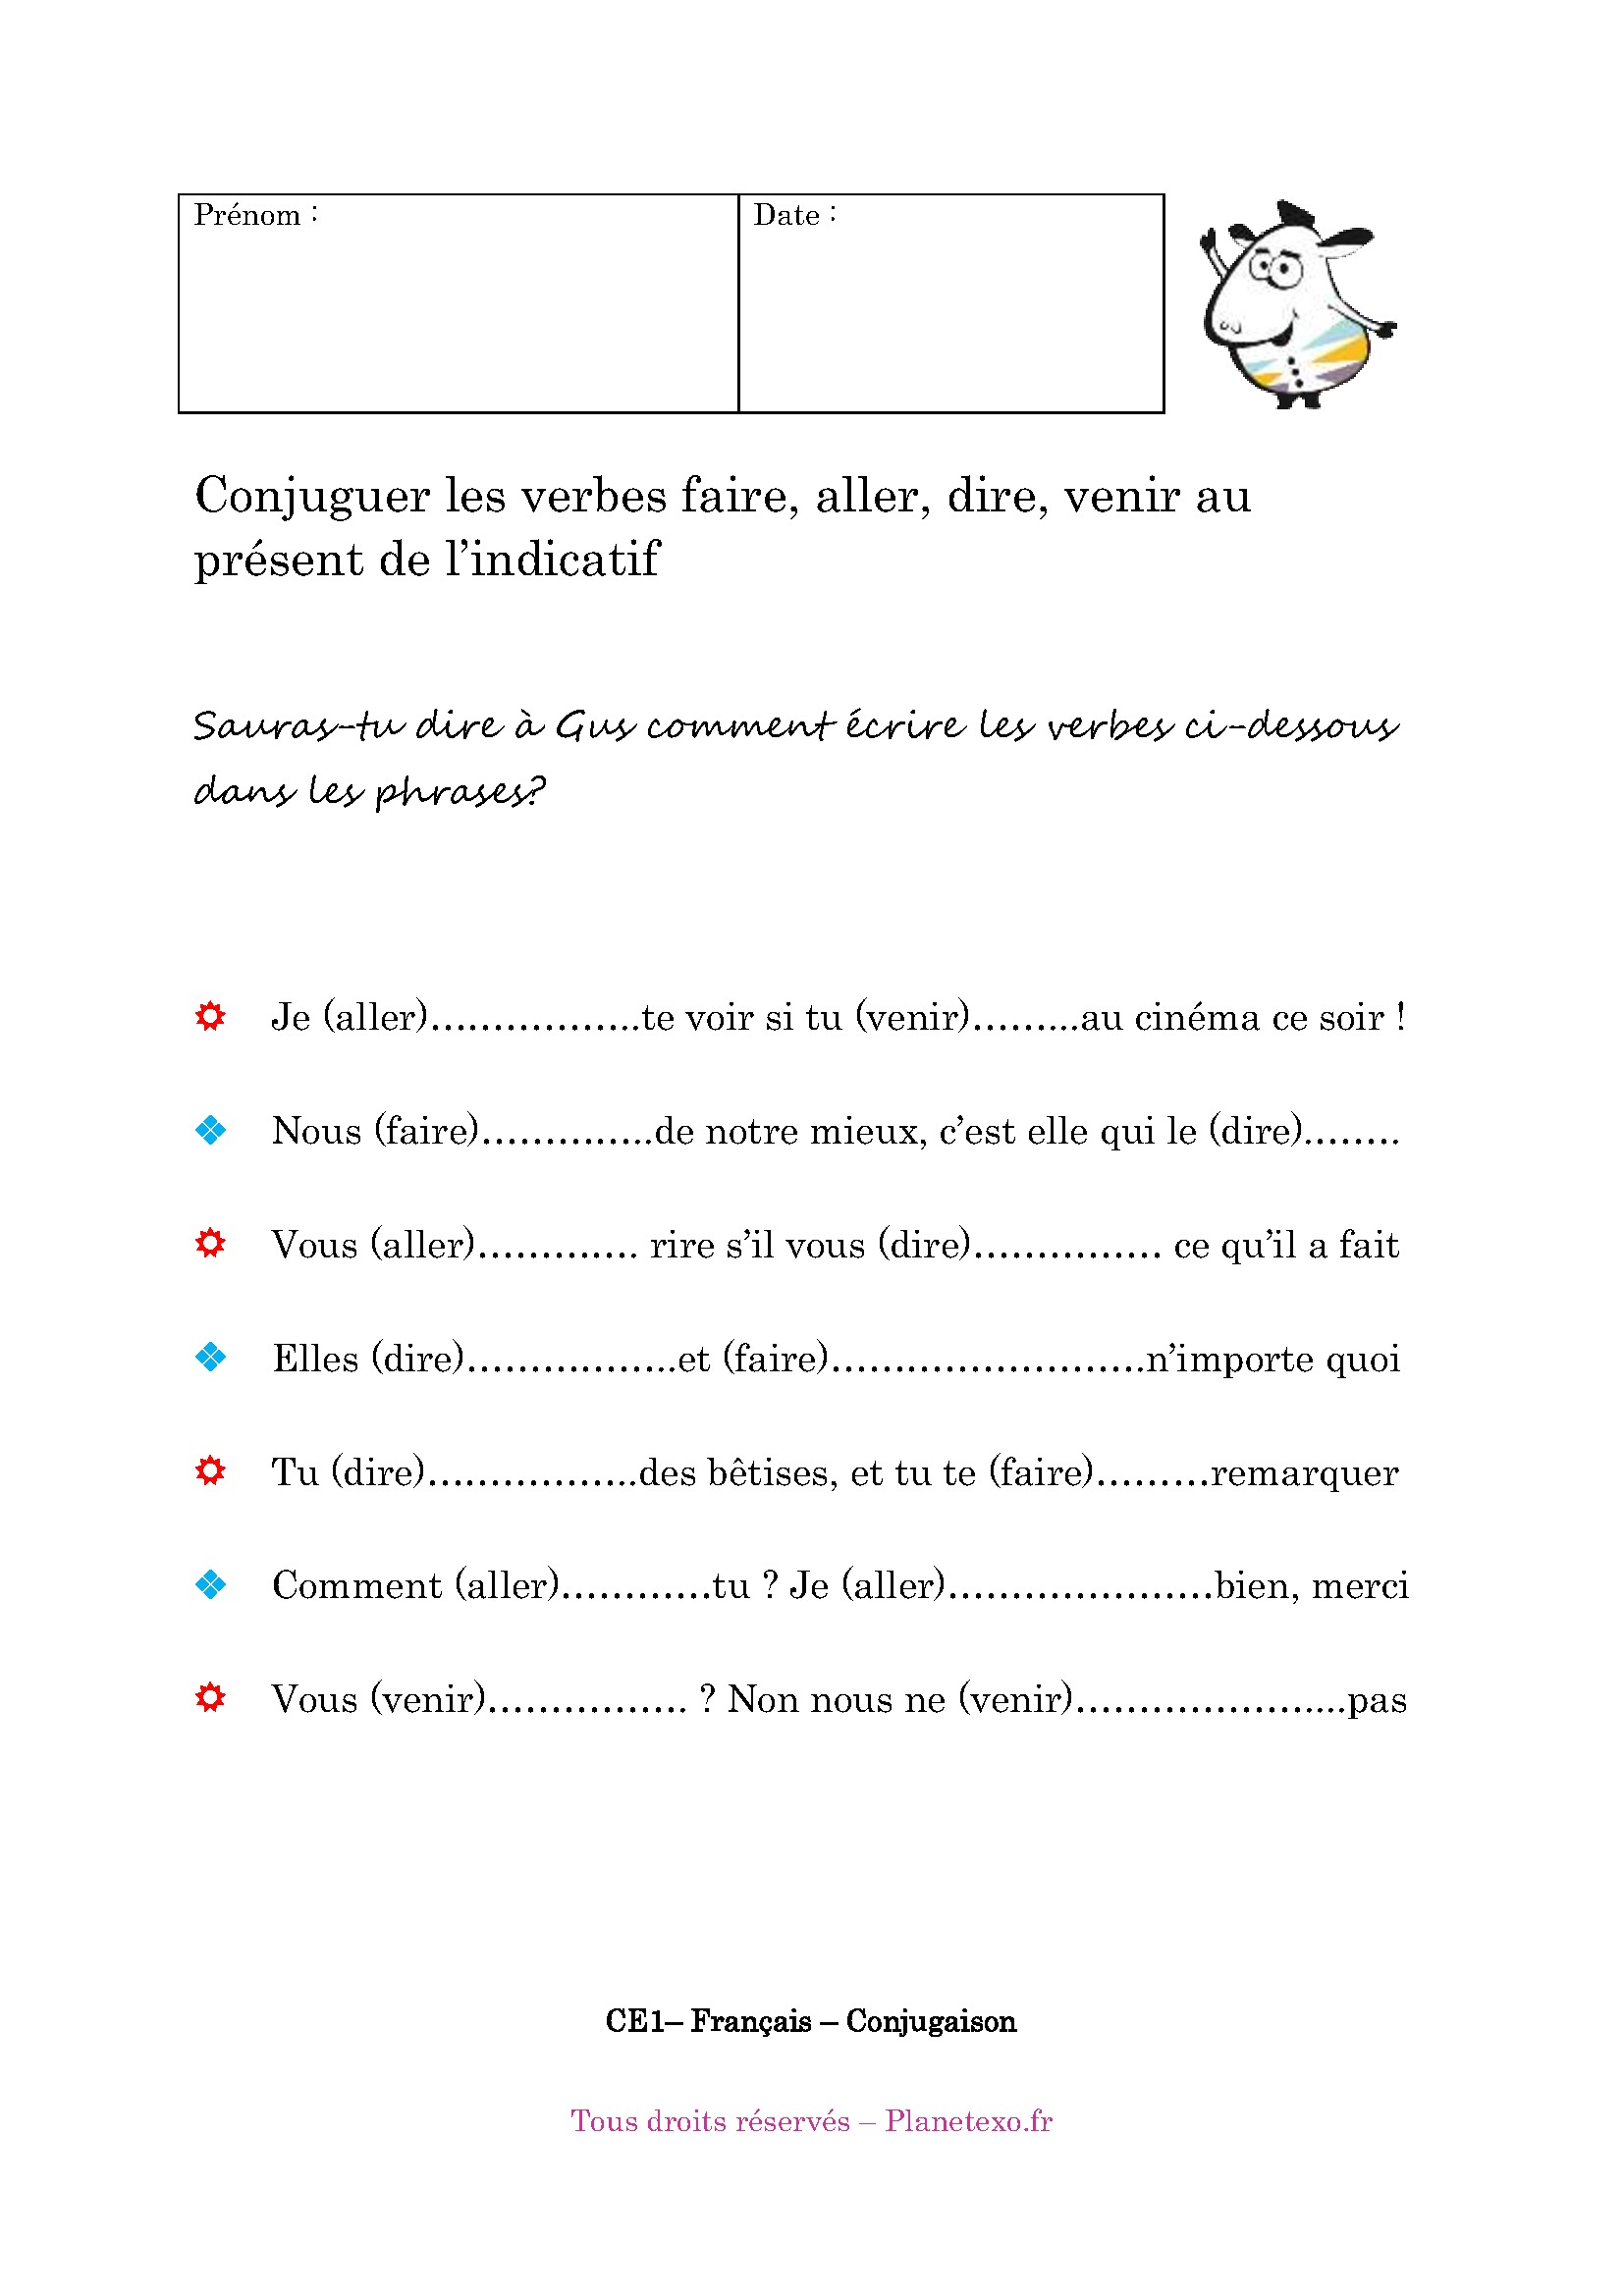 Conjugaison Verbe Dire Au Present De L Indicatif